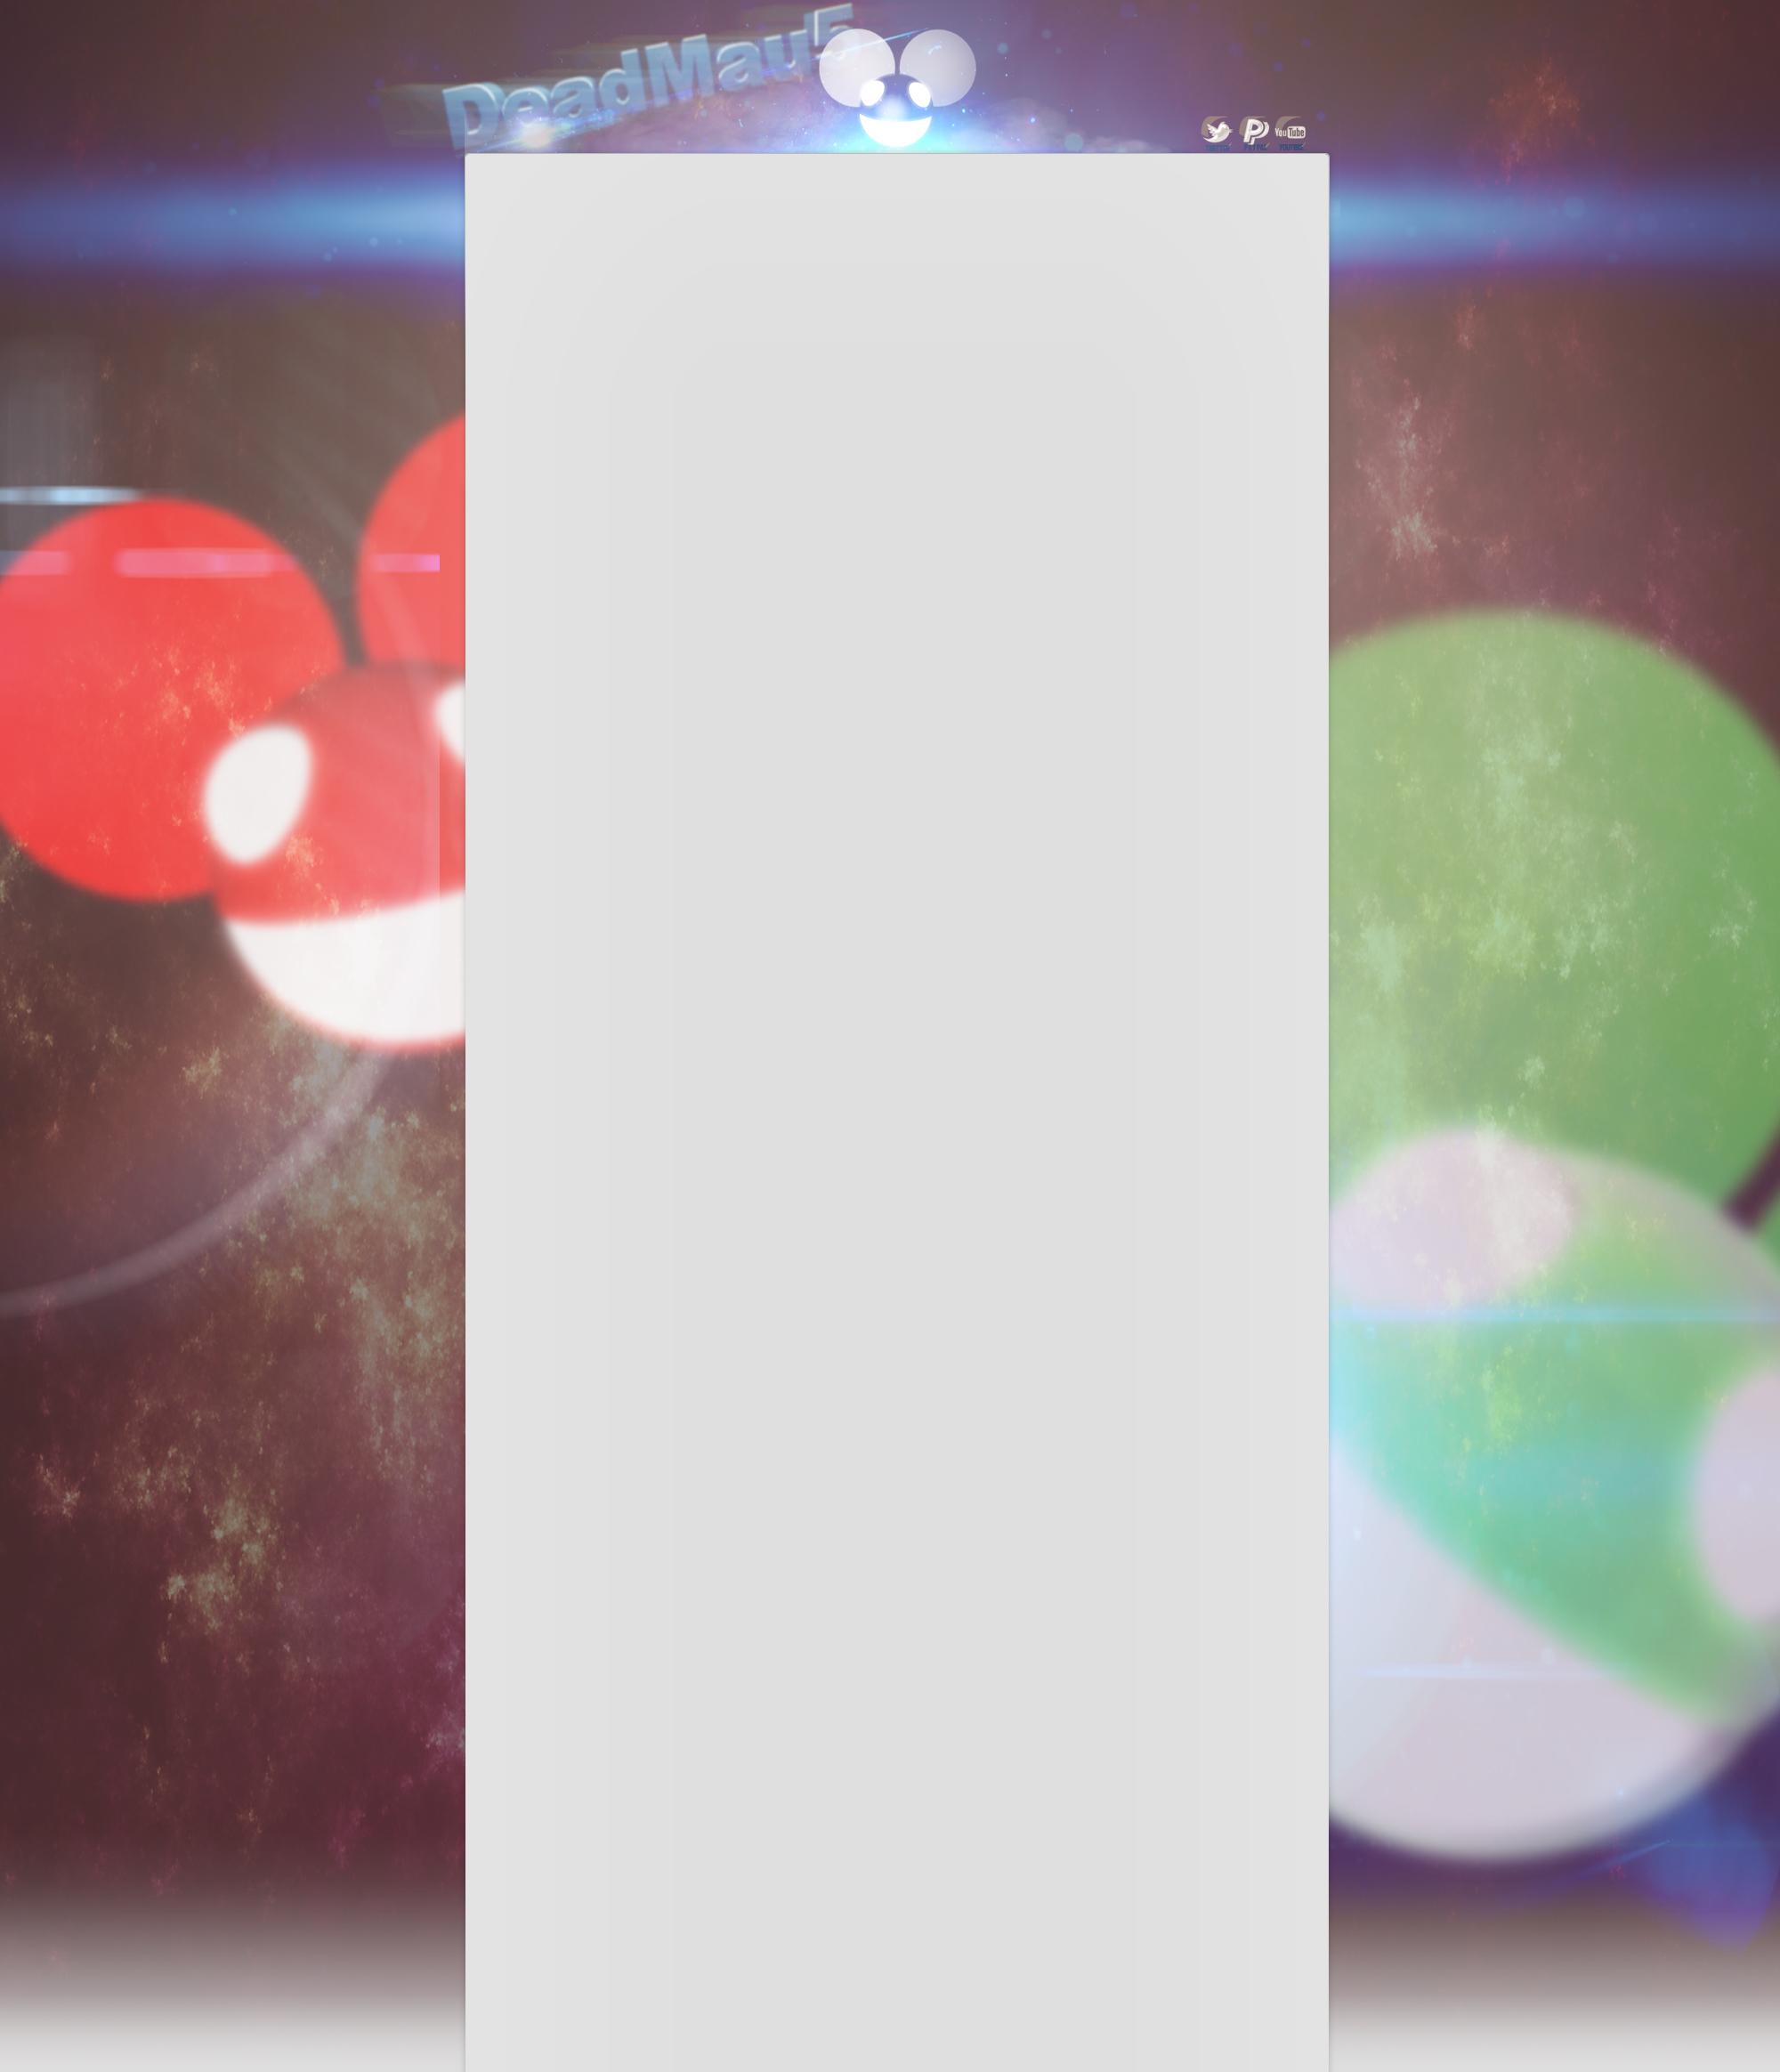 Youtube Background by McQueenArt